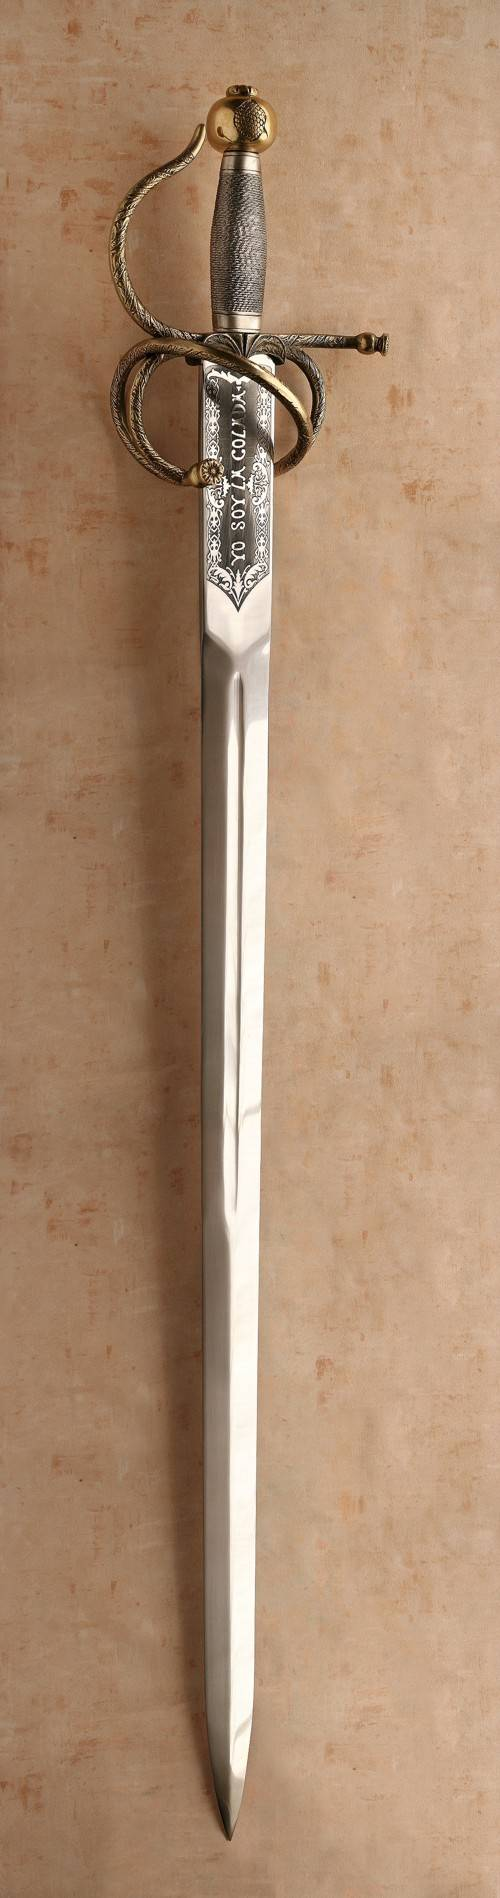 Espada Colada Acero Toledano